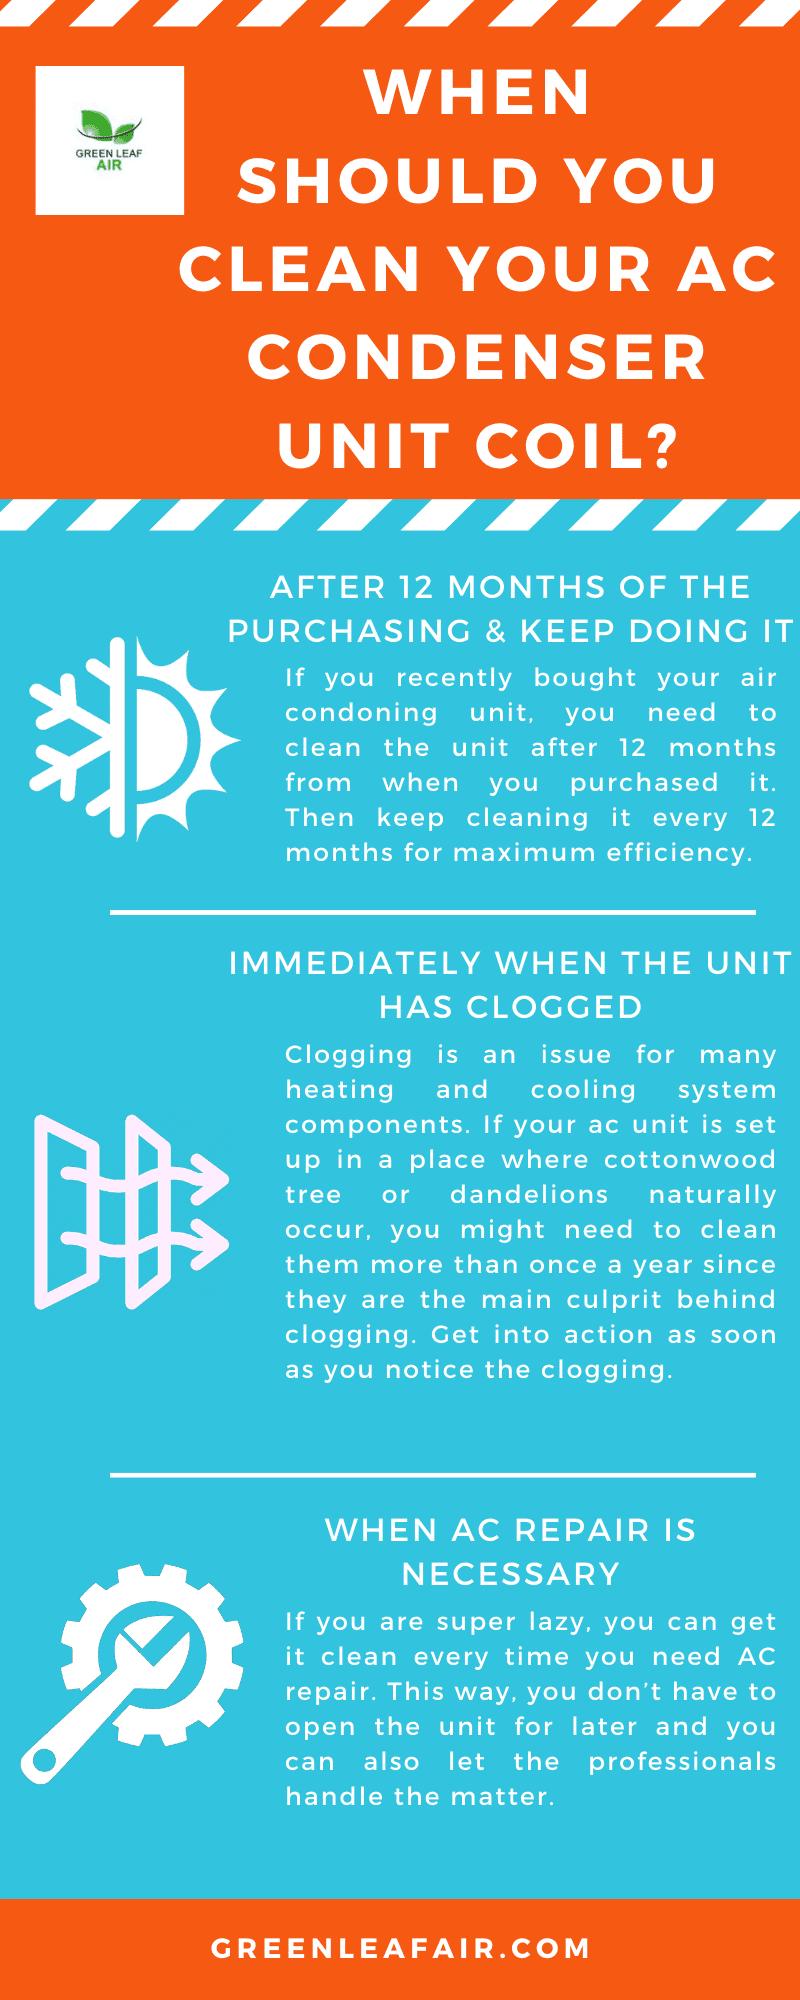 When Should You Clean Your AC Condenser Unit Coil